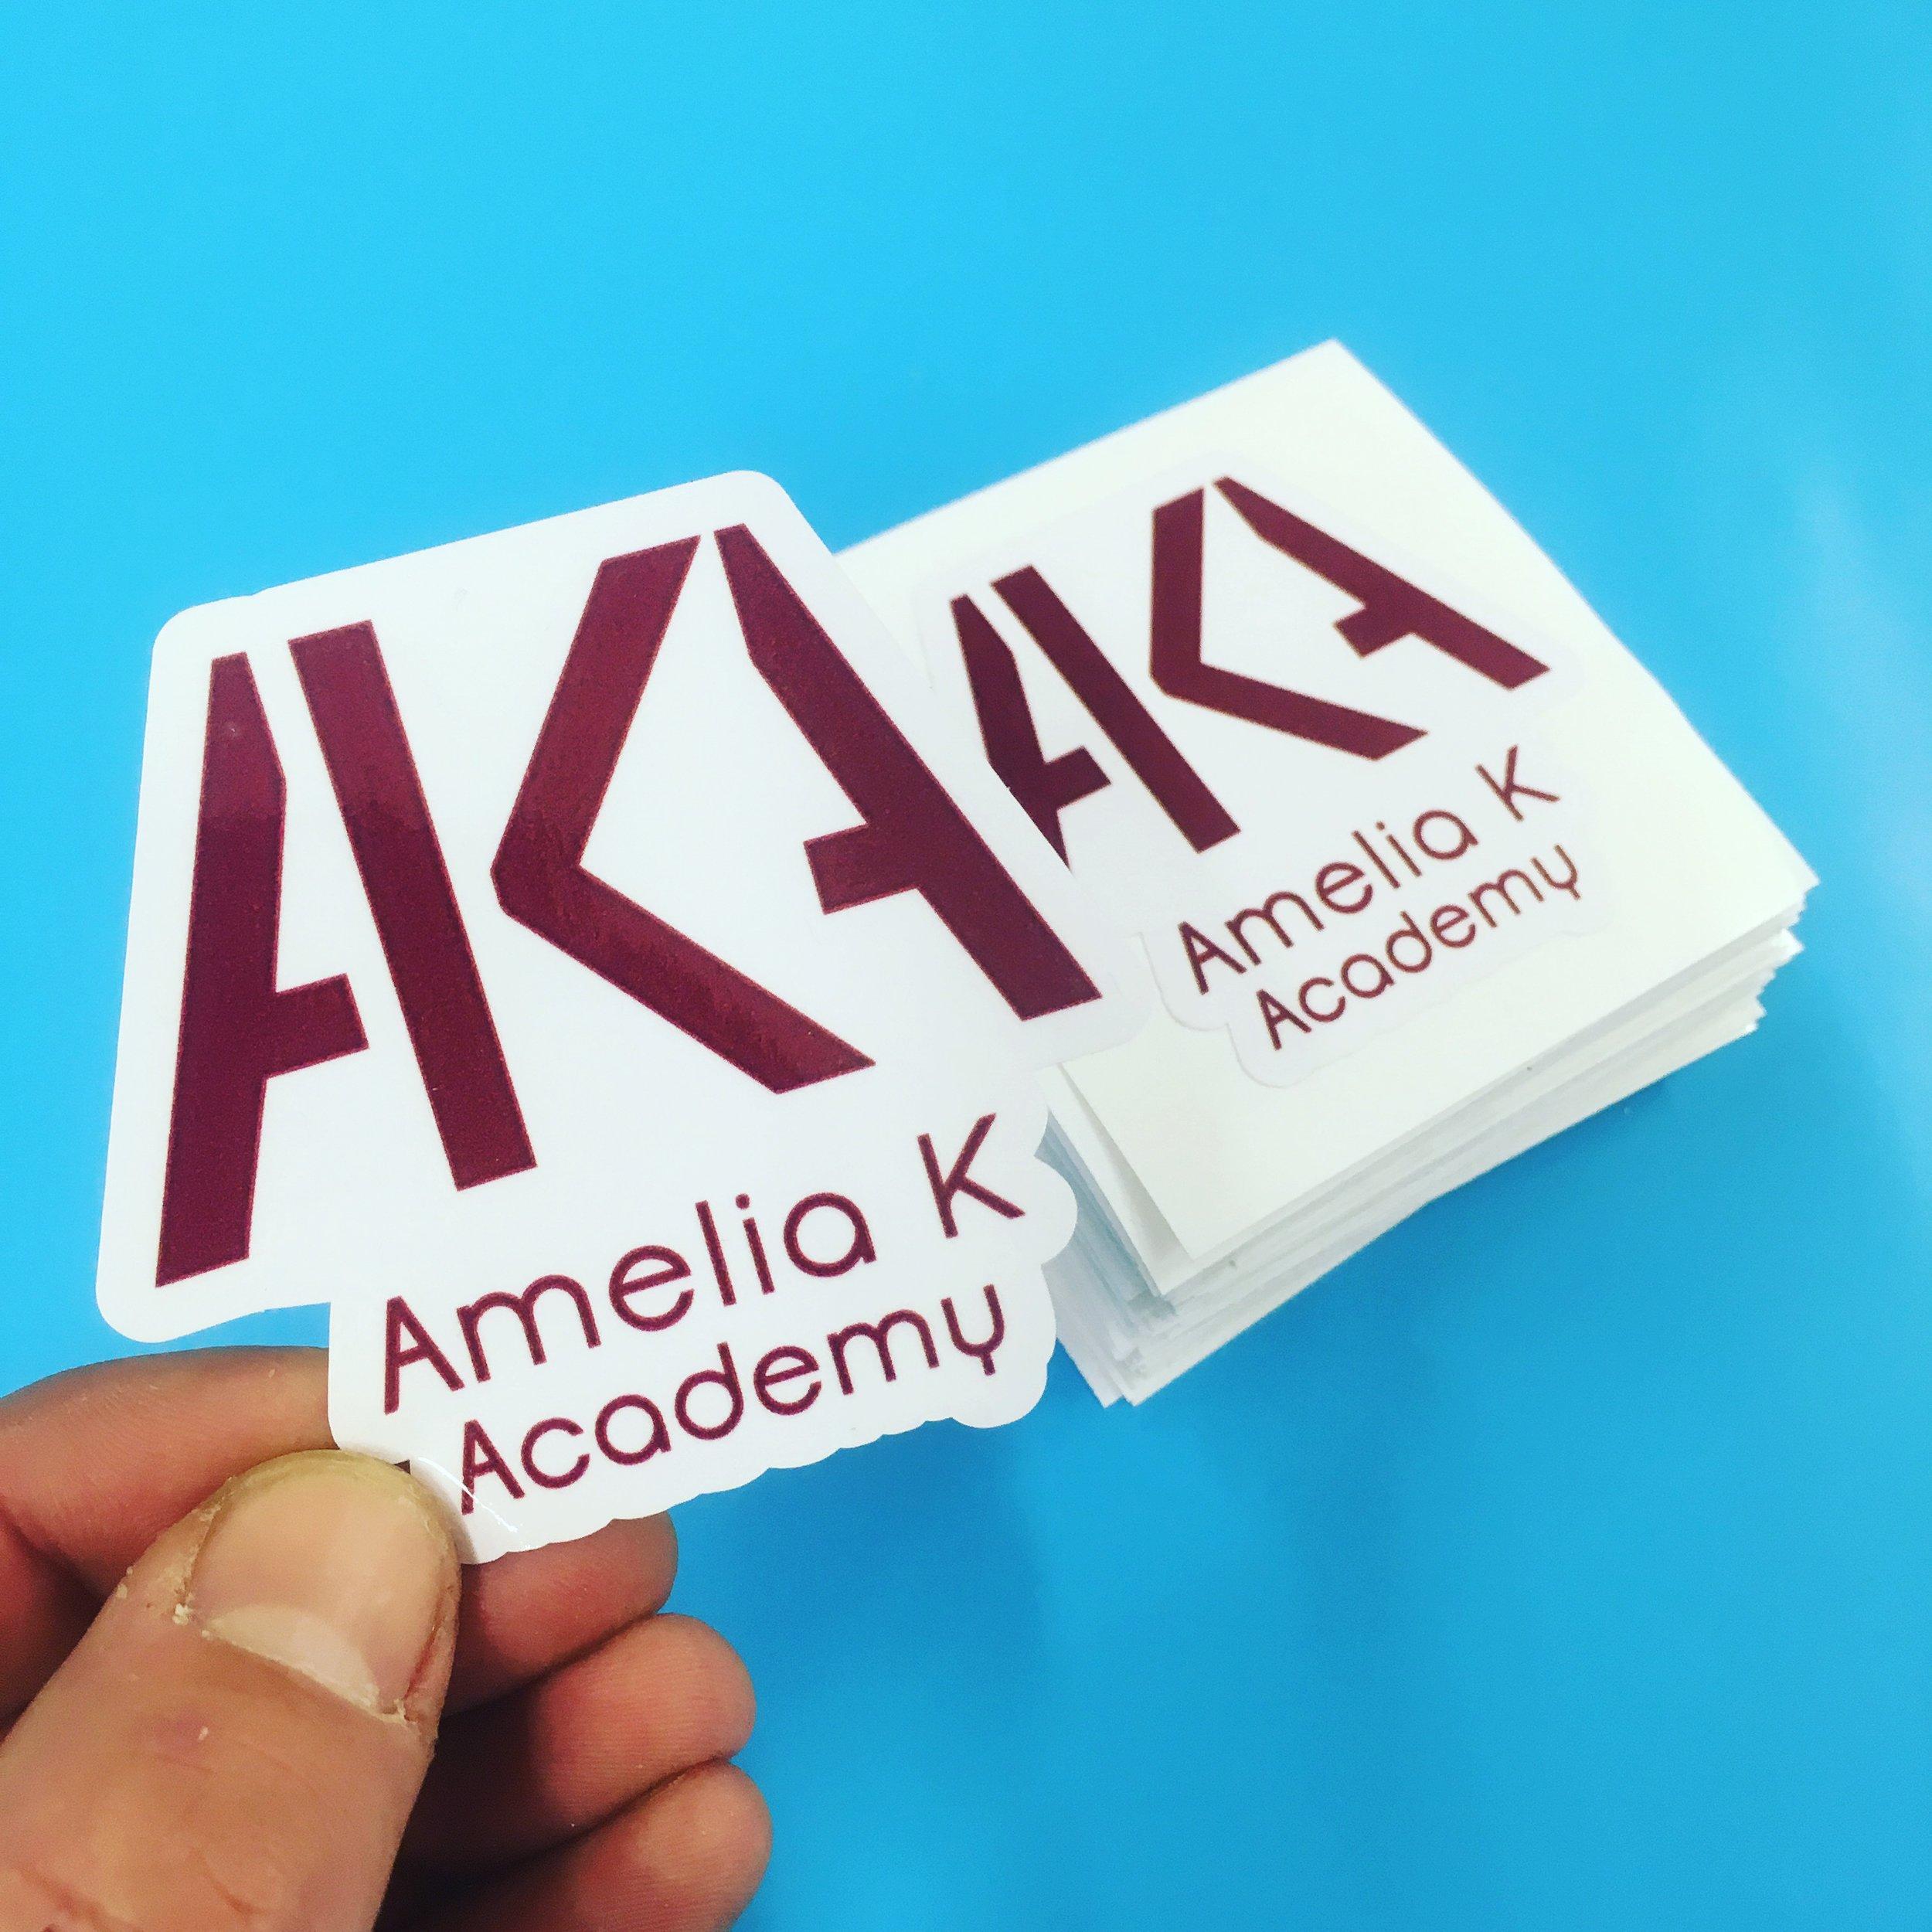 die-cut-sticker-printers-malvern-worcester-amelia-k-academy-red-penguin.JPG